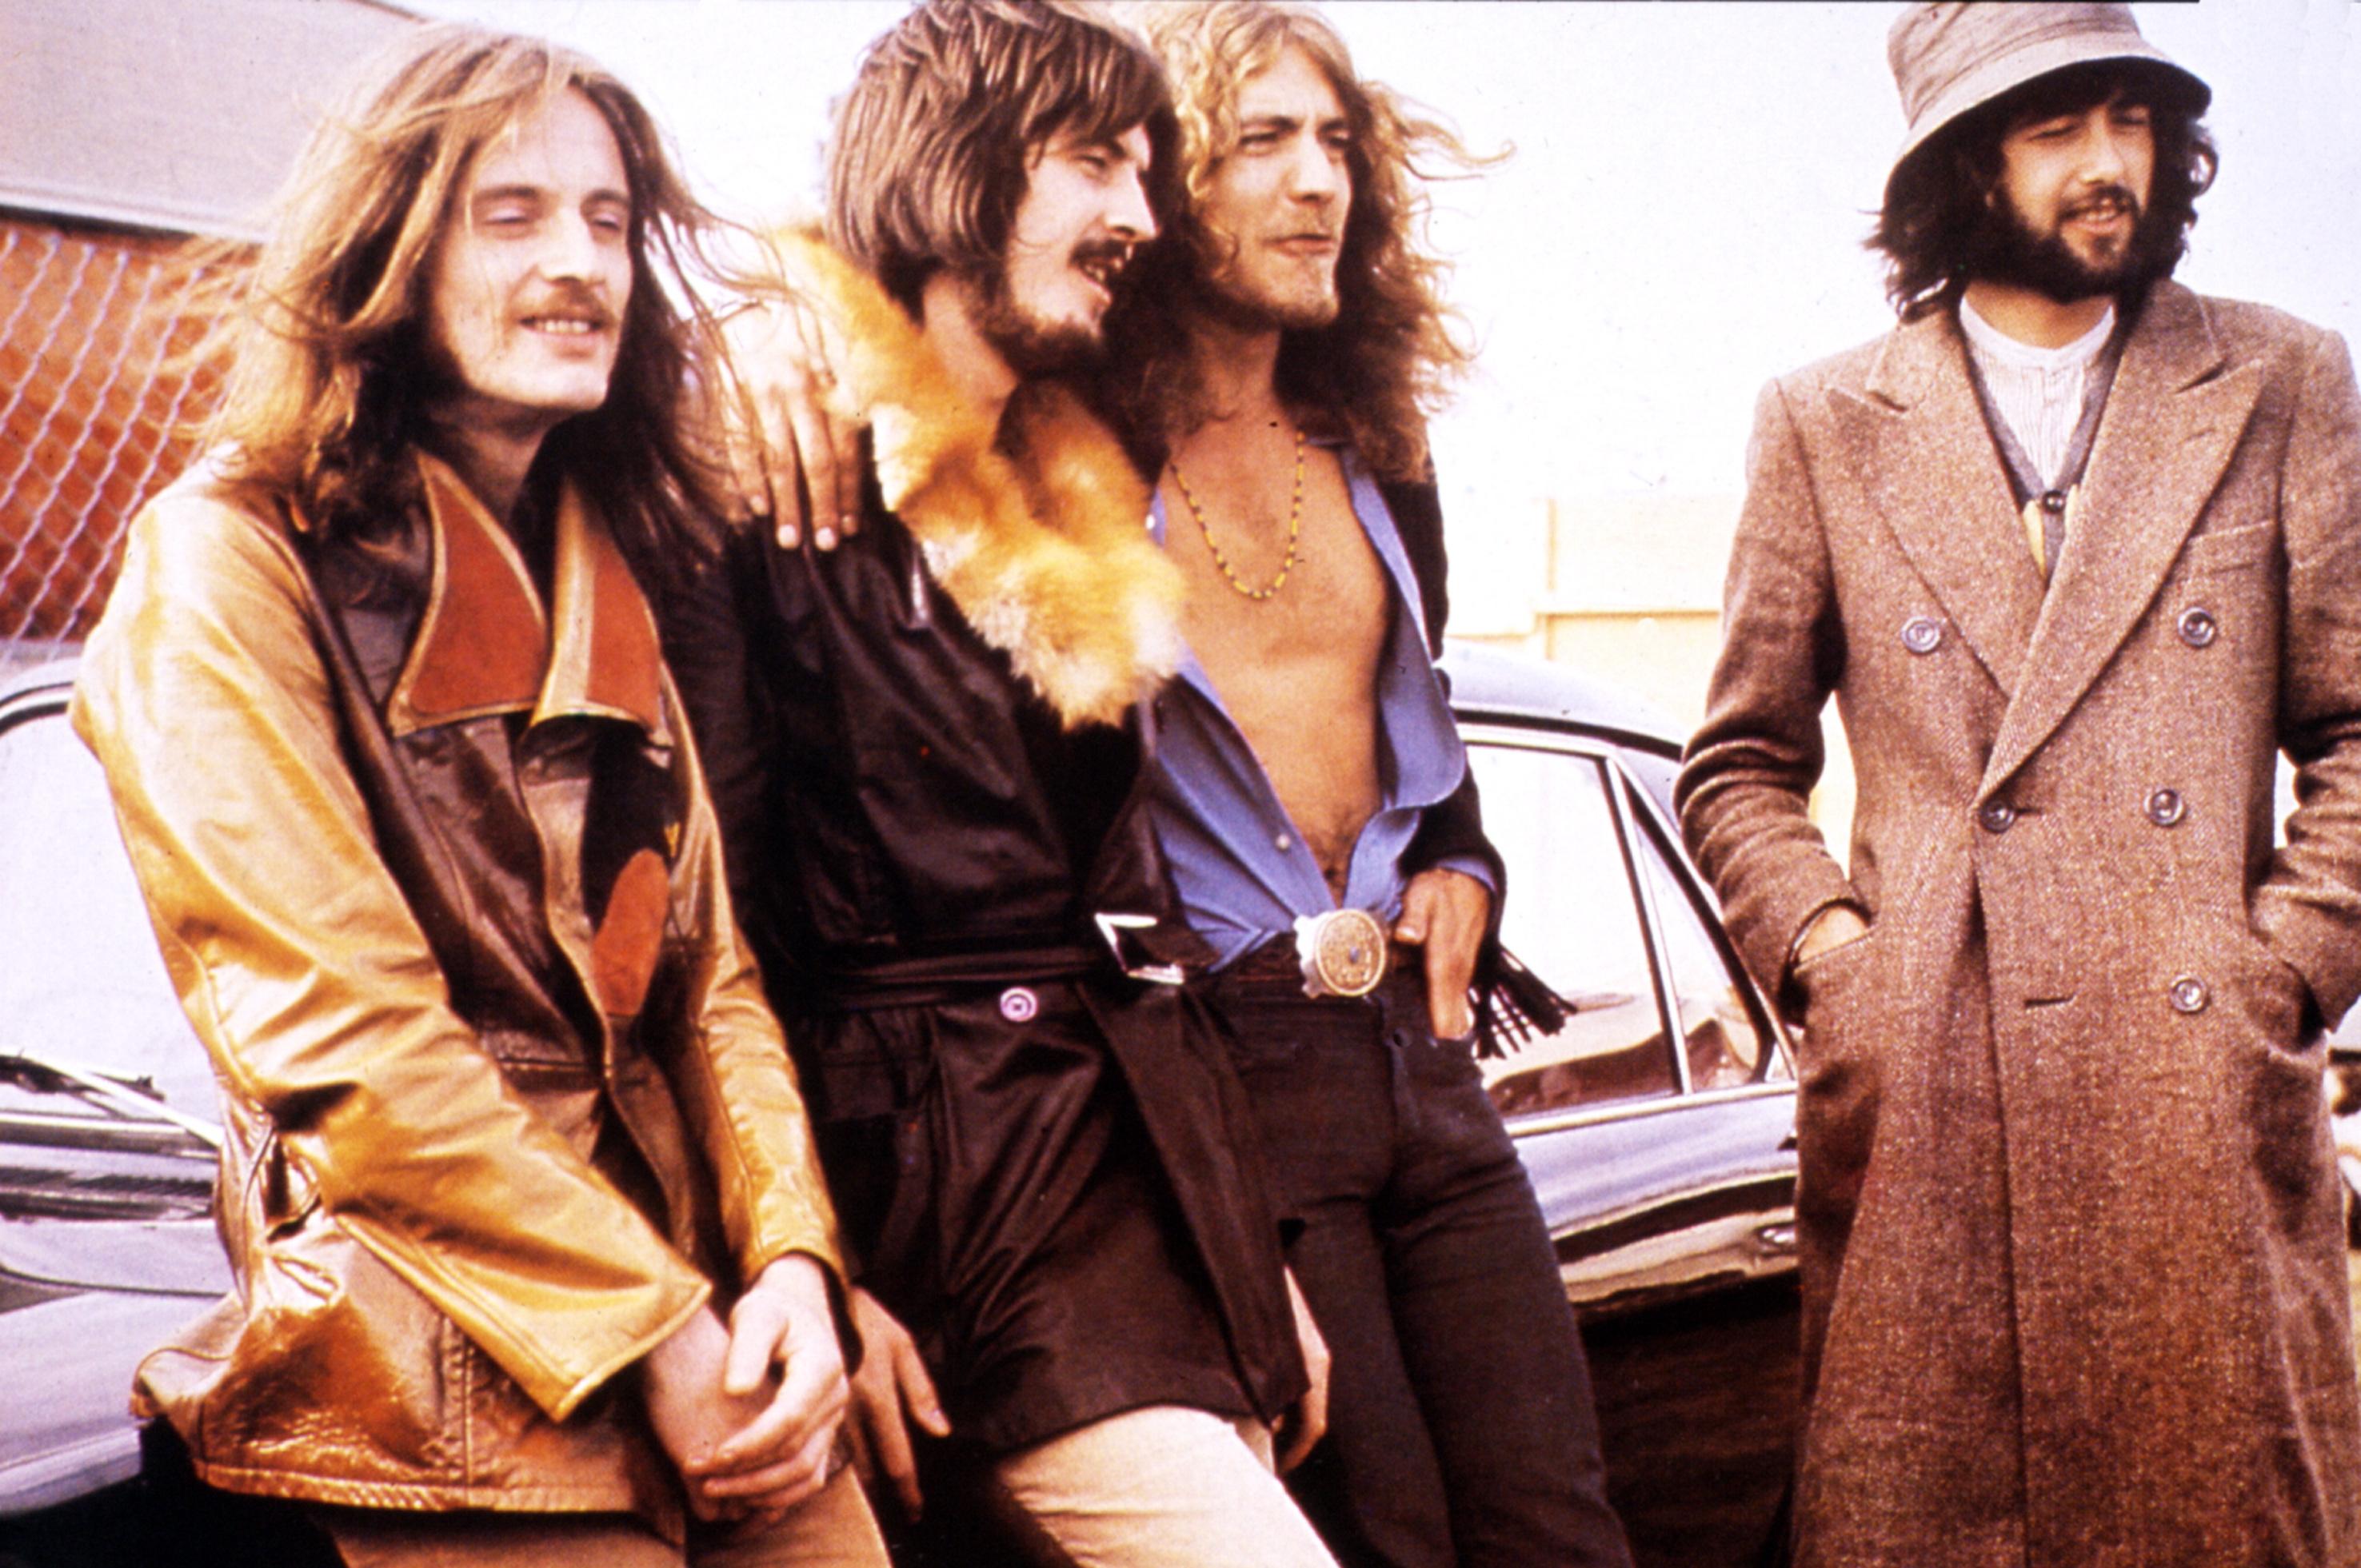 Led Zeppelin Backgrounds, Compatible - PC, Mobile, Gadgets  2952x1961 px